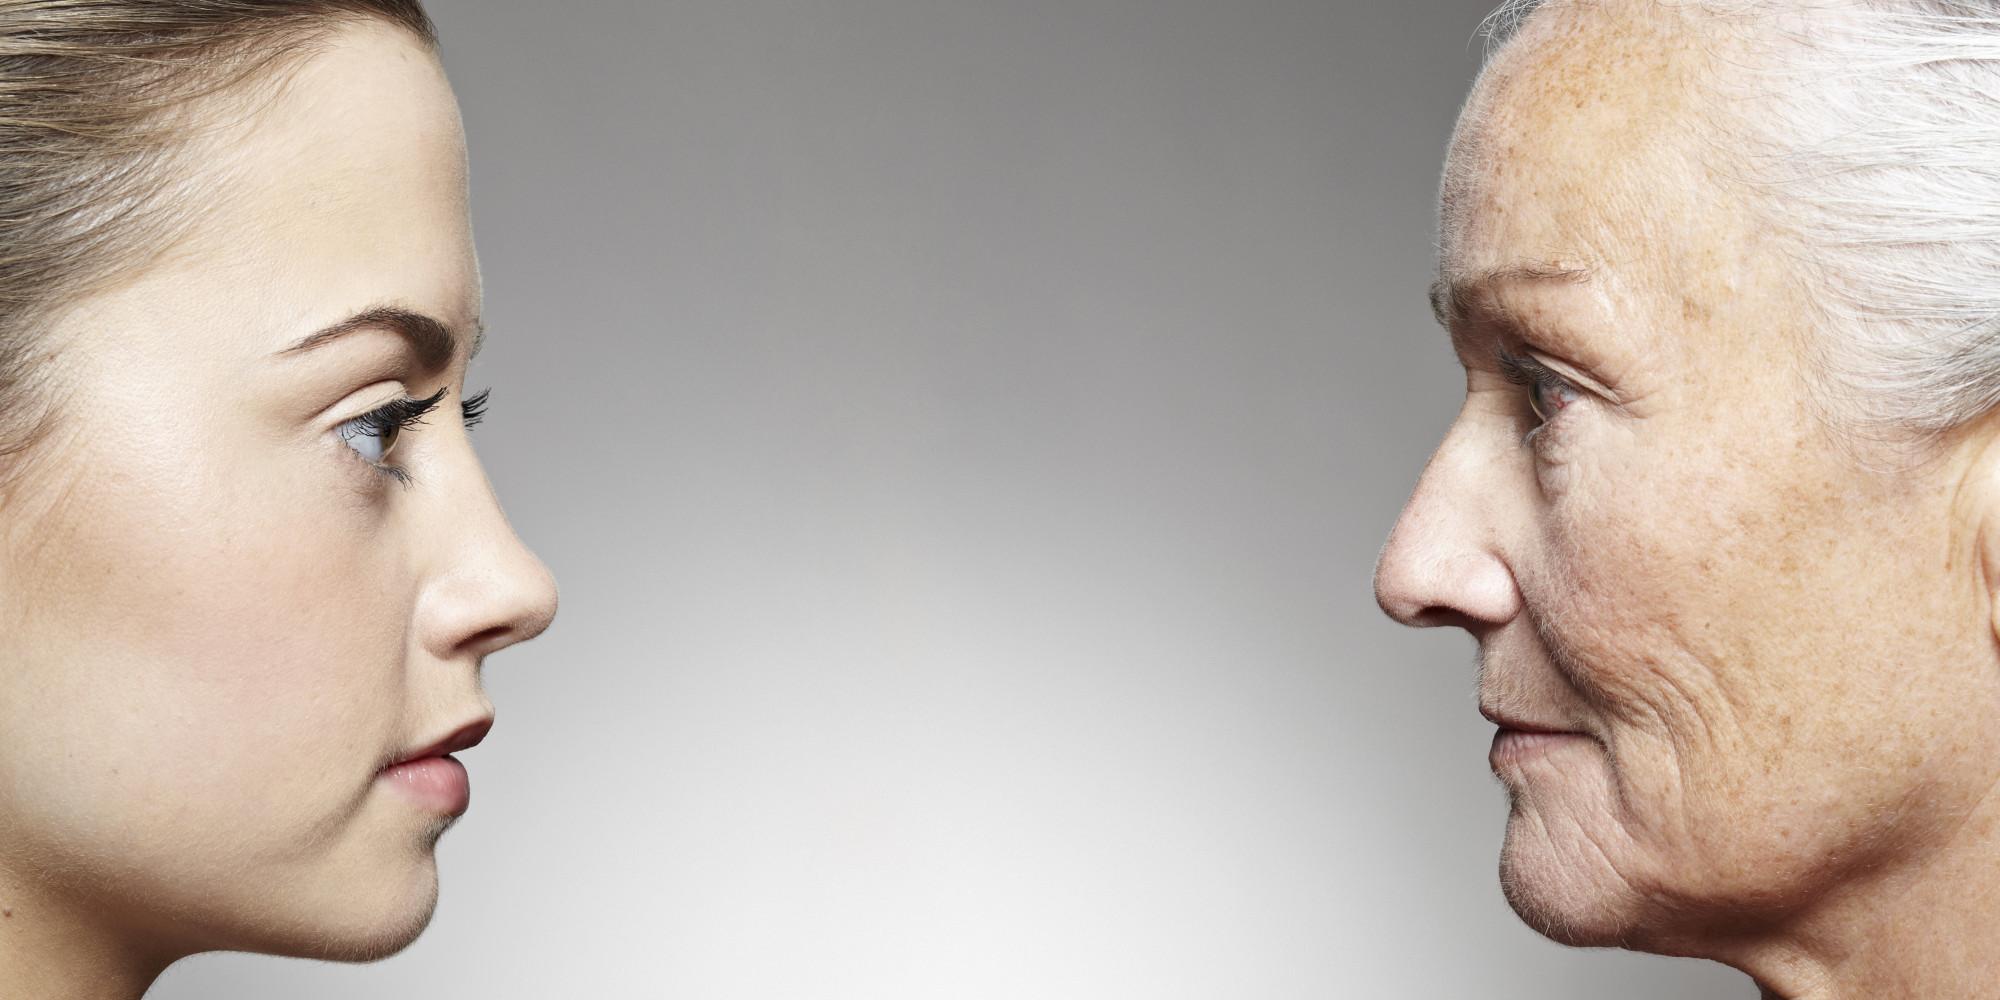 Mau Selalu Awet Muda? Hentikanlah Kebiasaan Buruk ini yang Dapat Mempercepat Penuaan Dini!